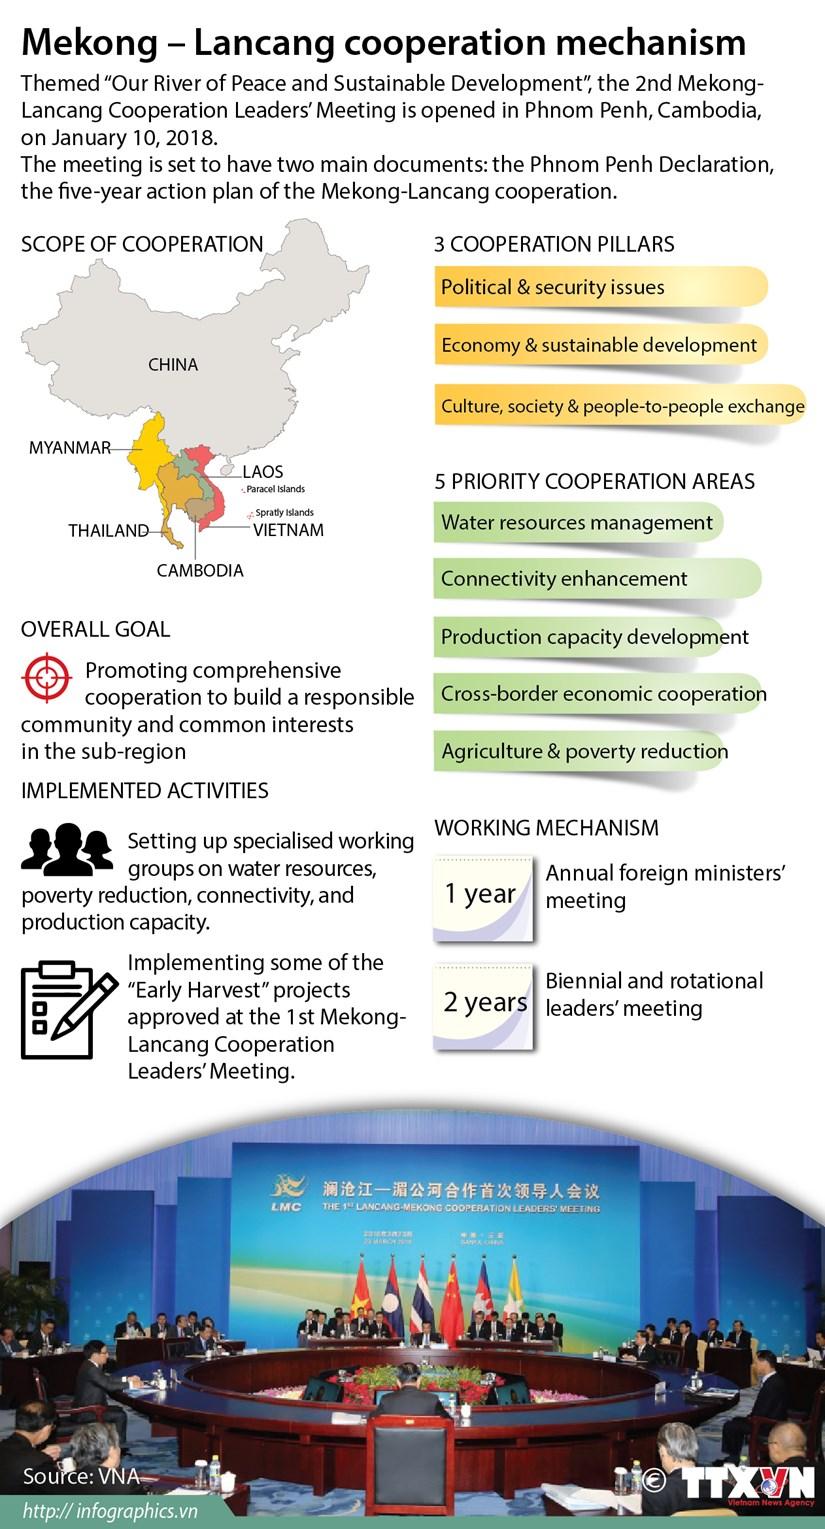 Mekong – Lancang cooperation mechanism hinh anh 1